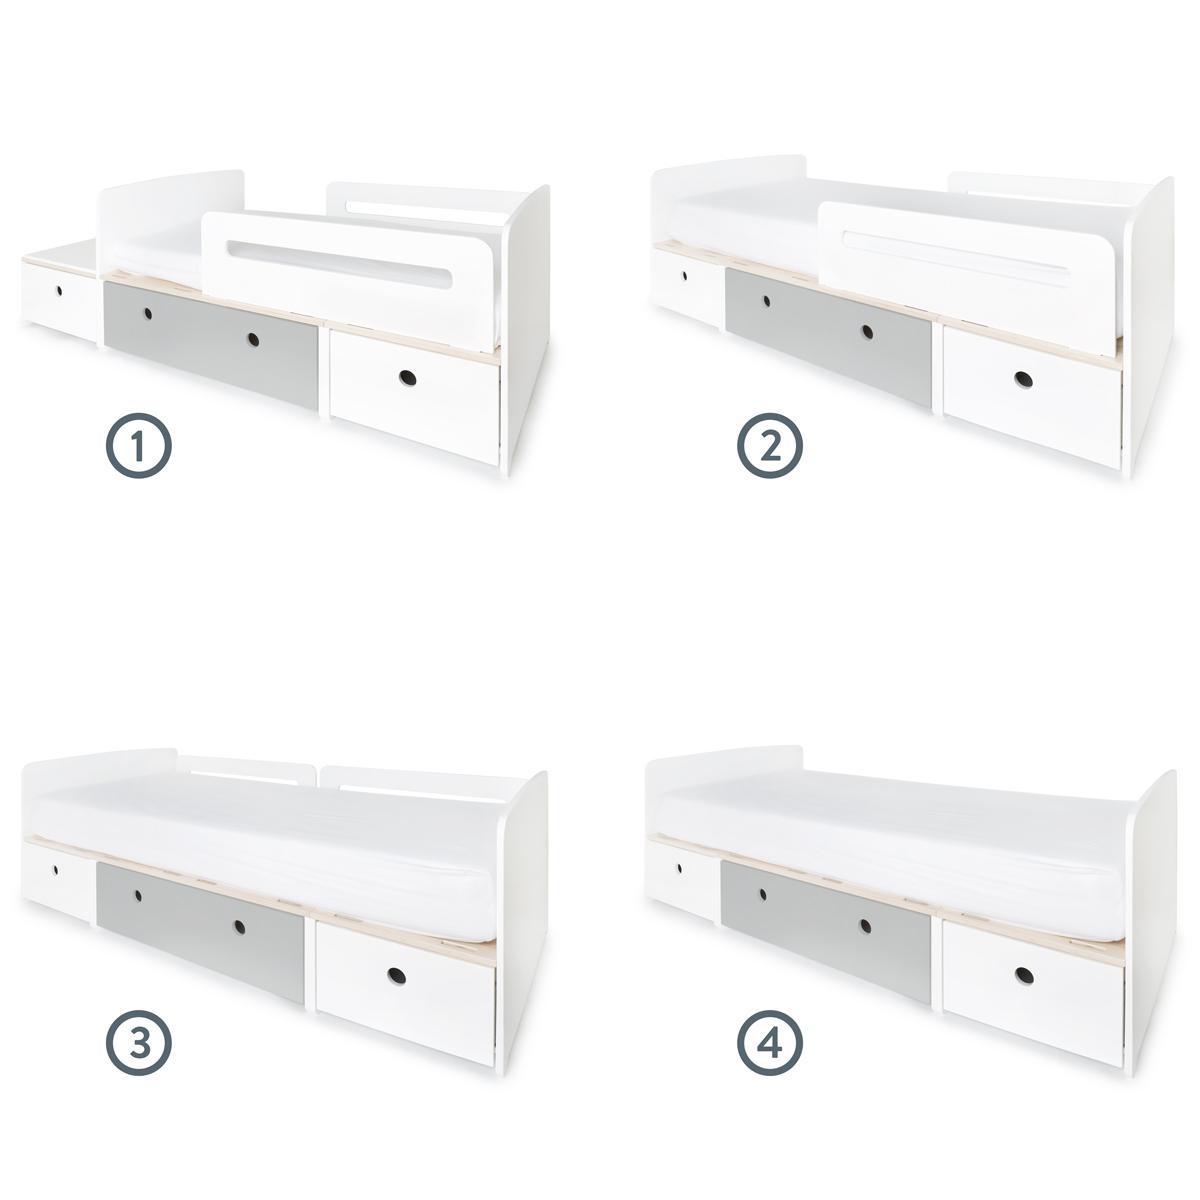 Juniorbett mitwachsend 90x150/200cm COLORFLEX white-pearl grey-white